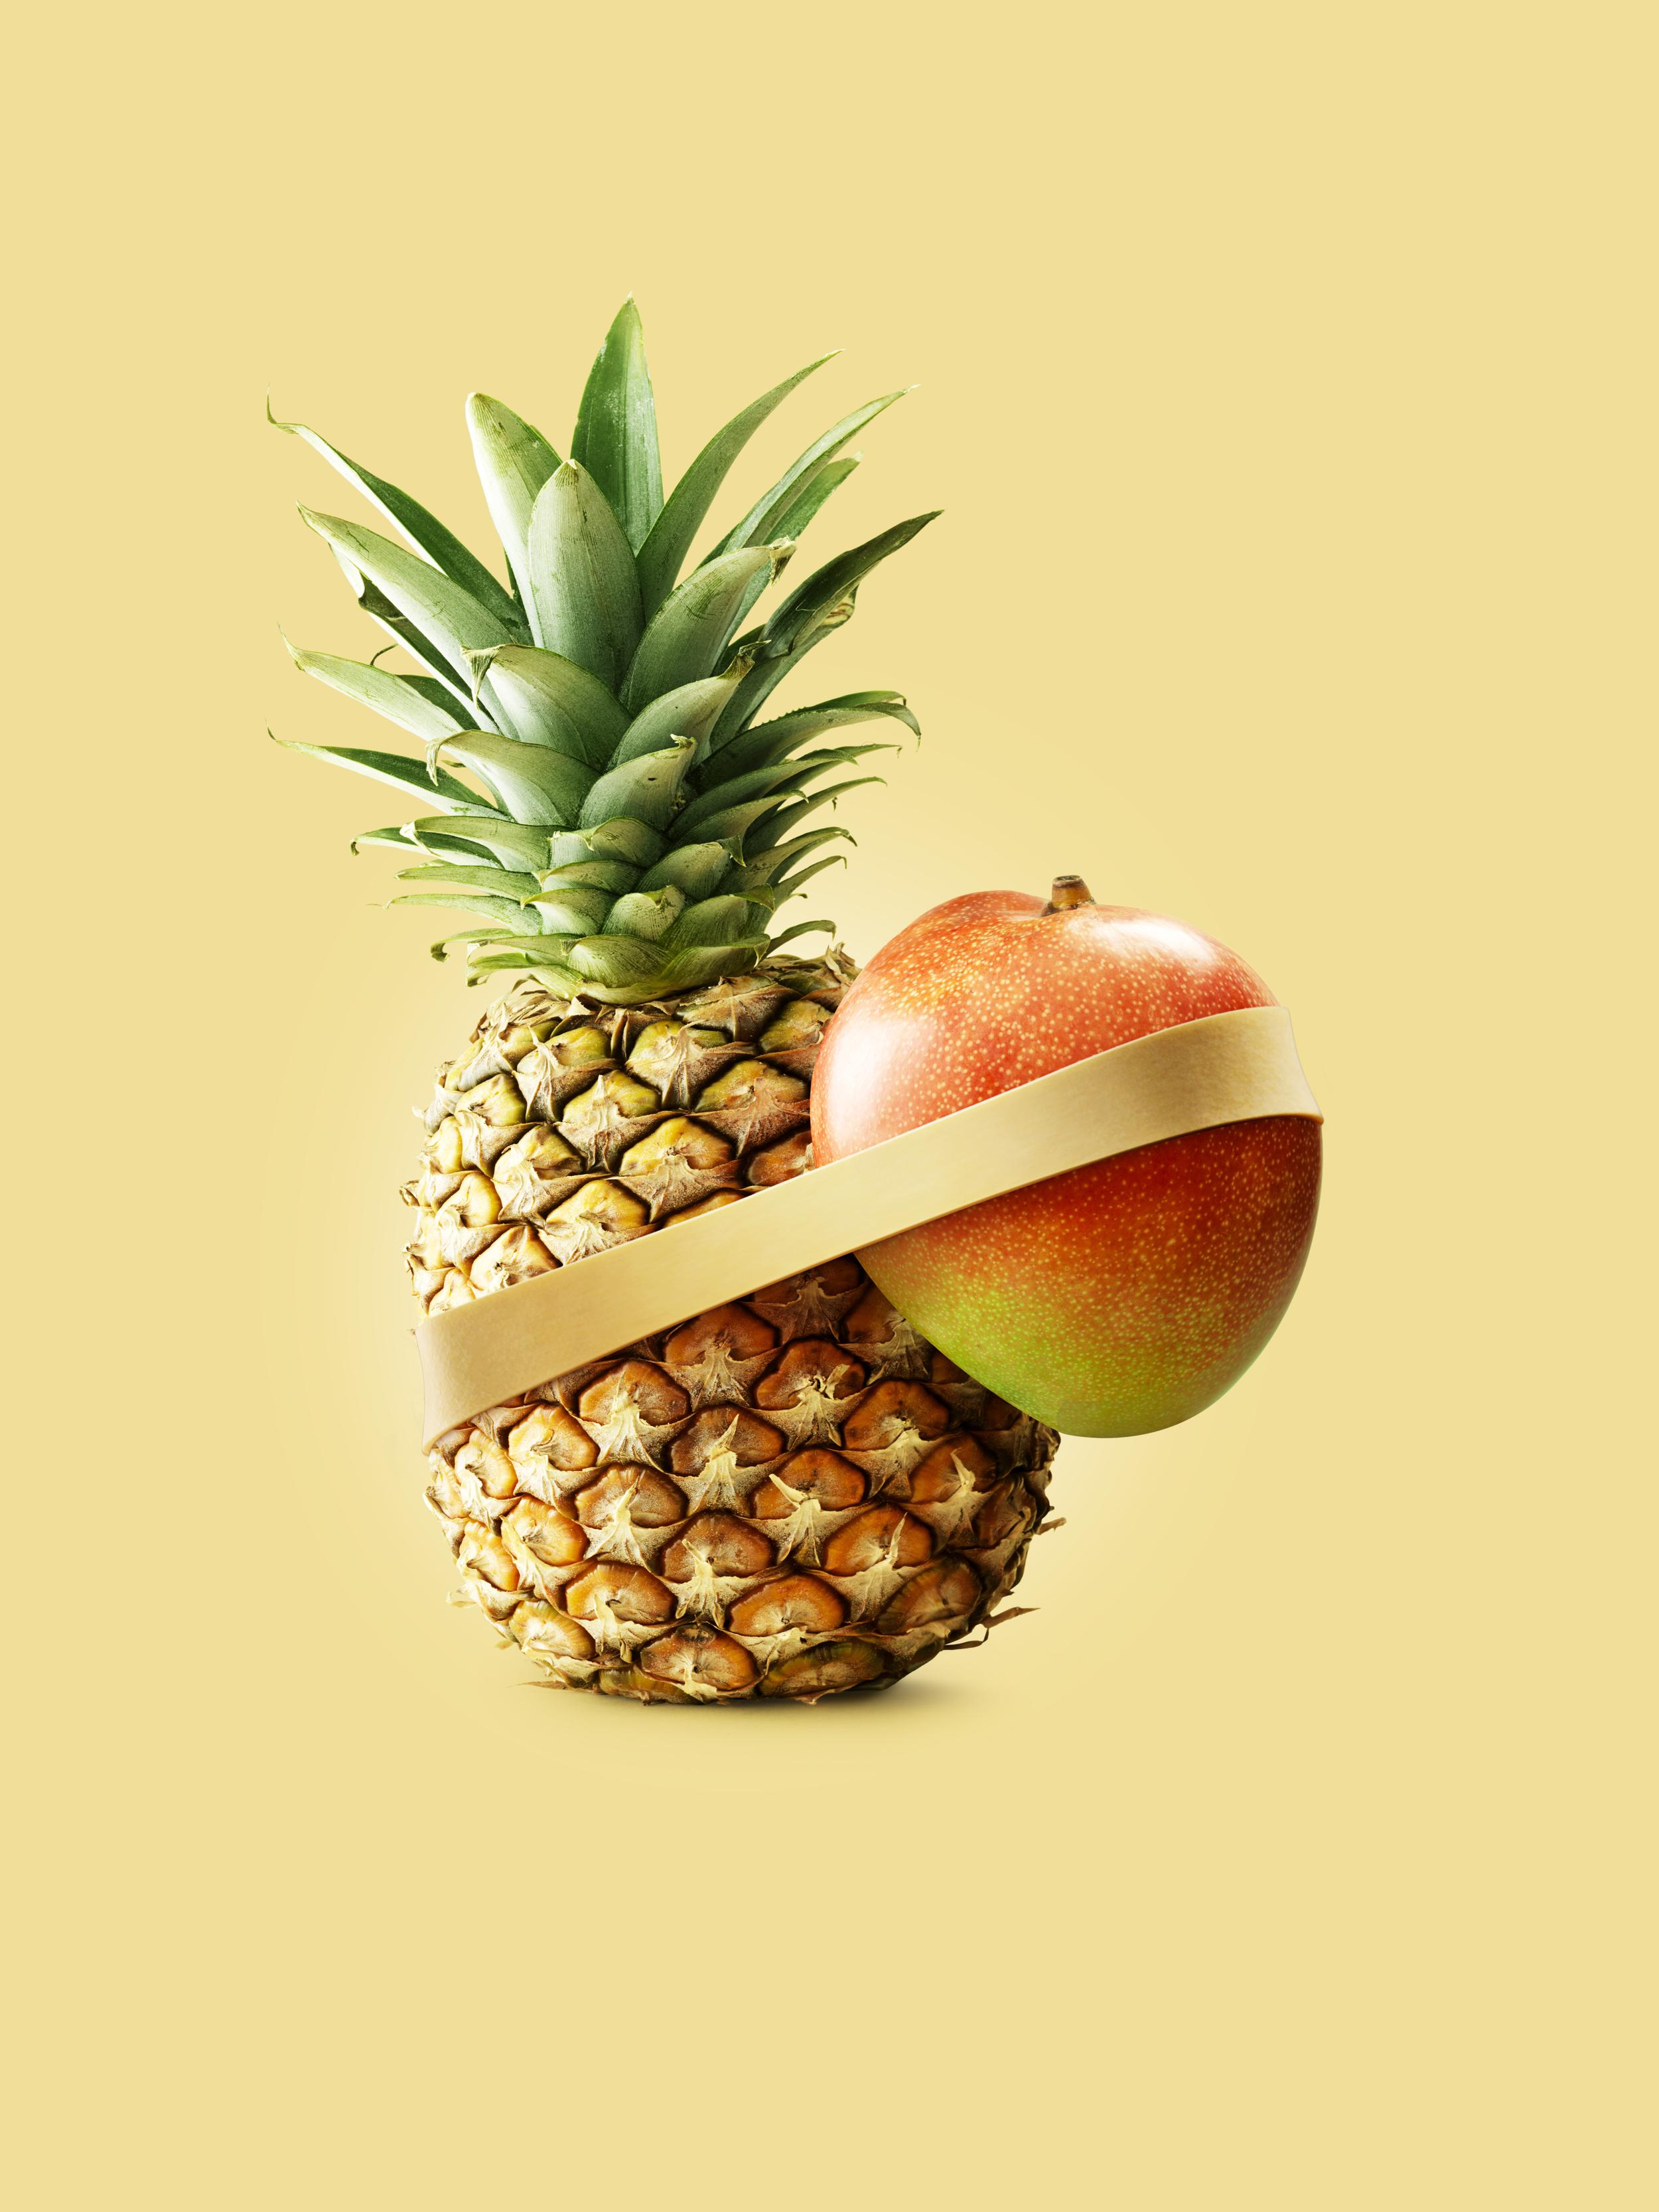 Yespers_producten_Mango_Ananas_3.jpg